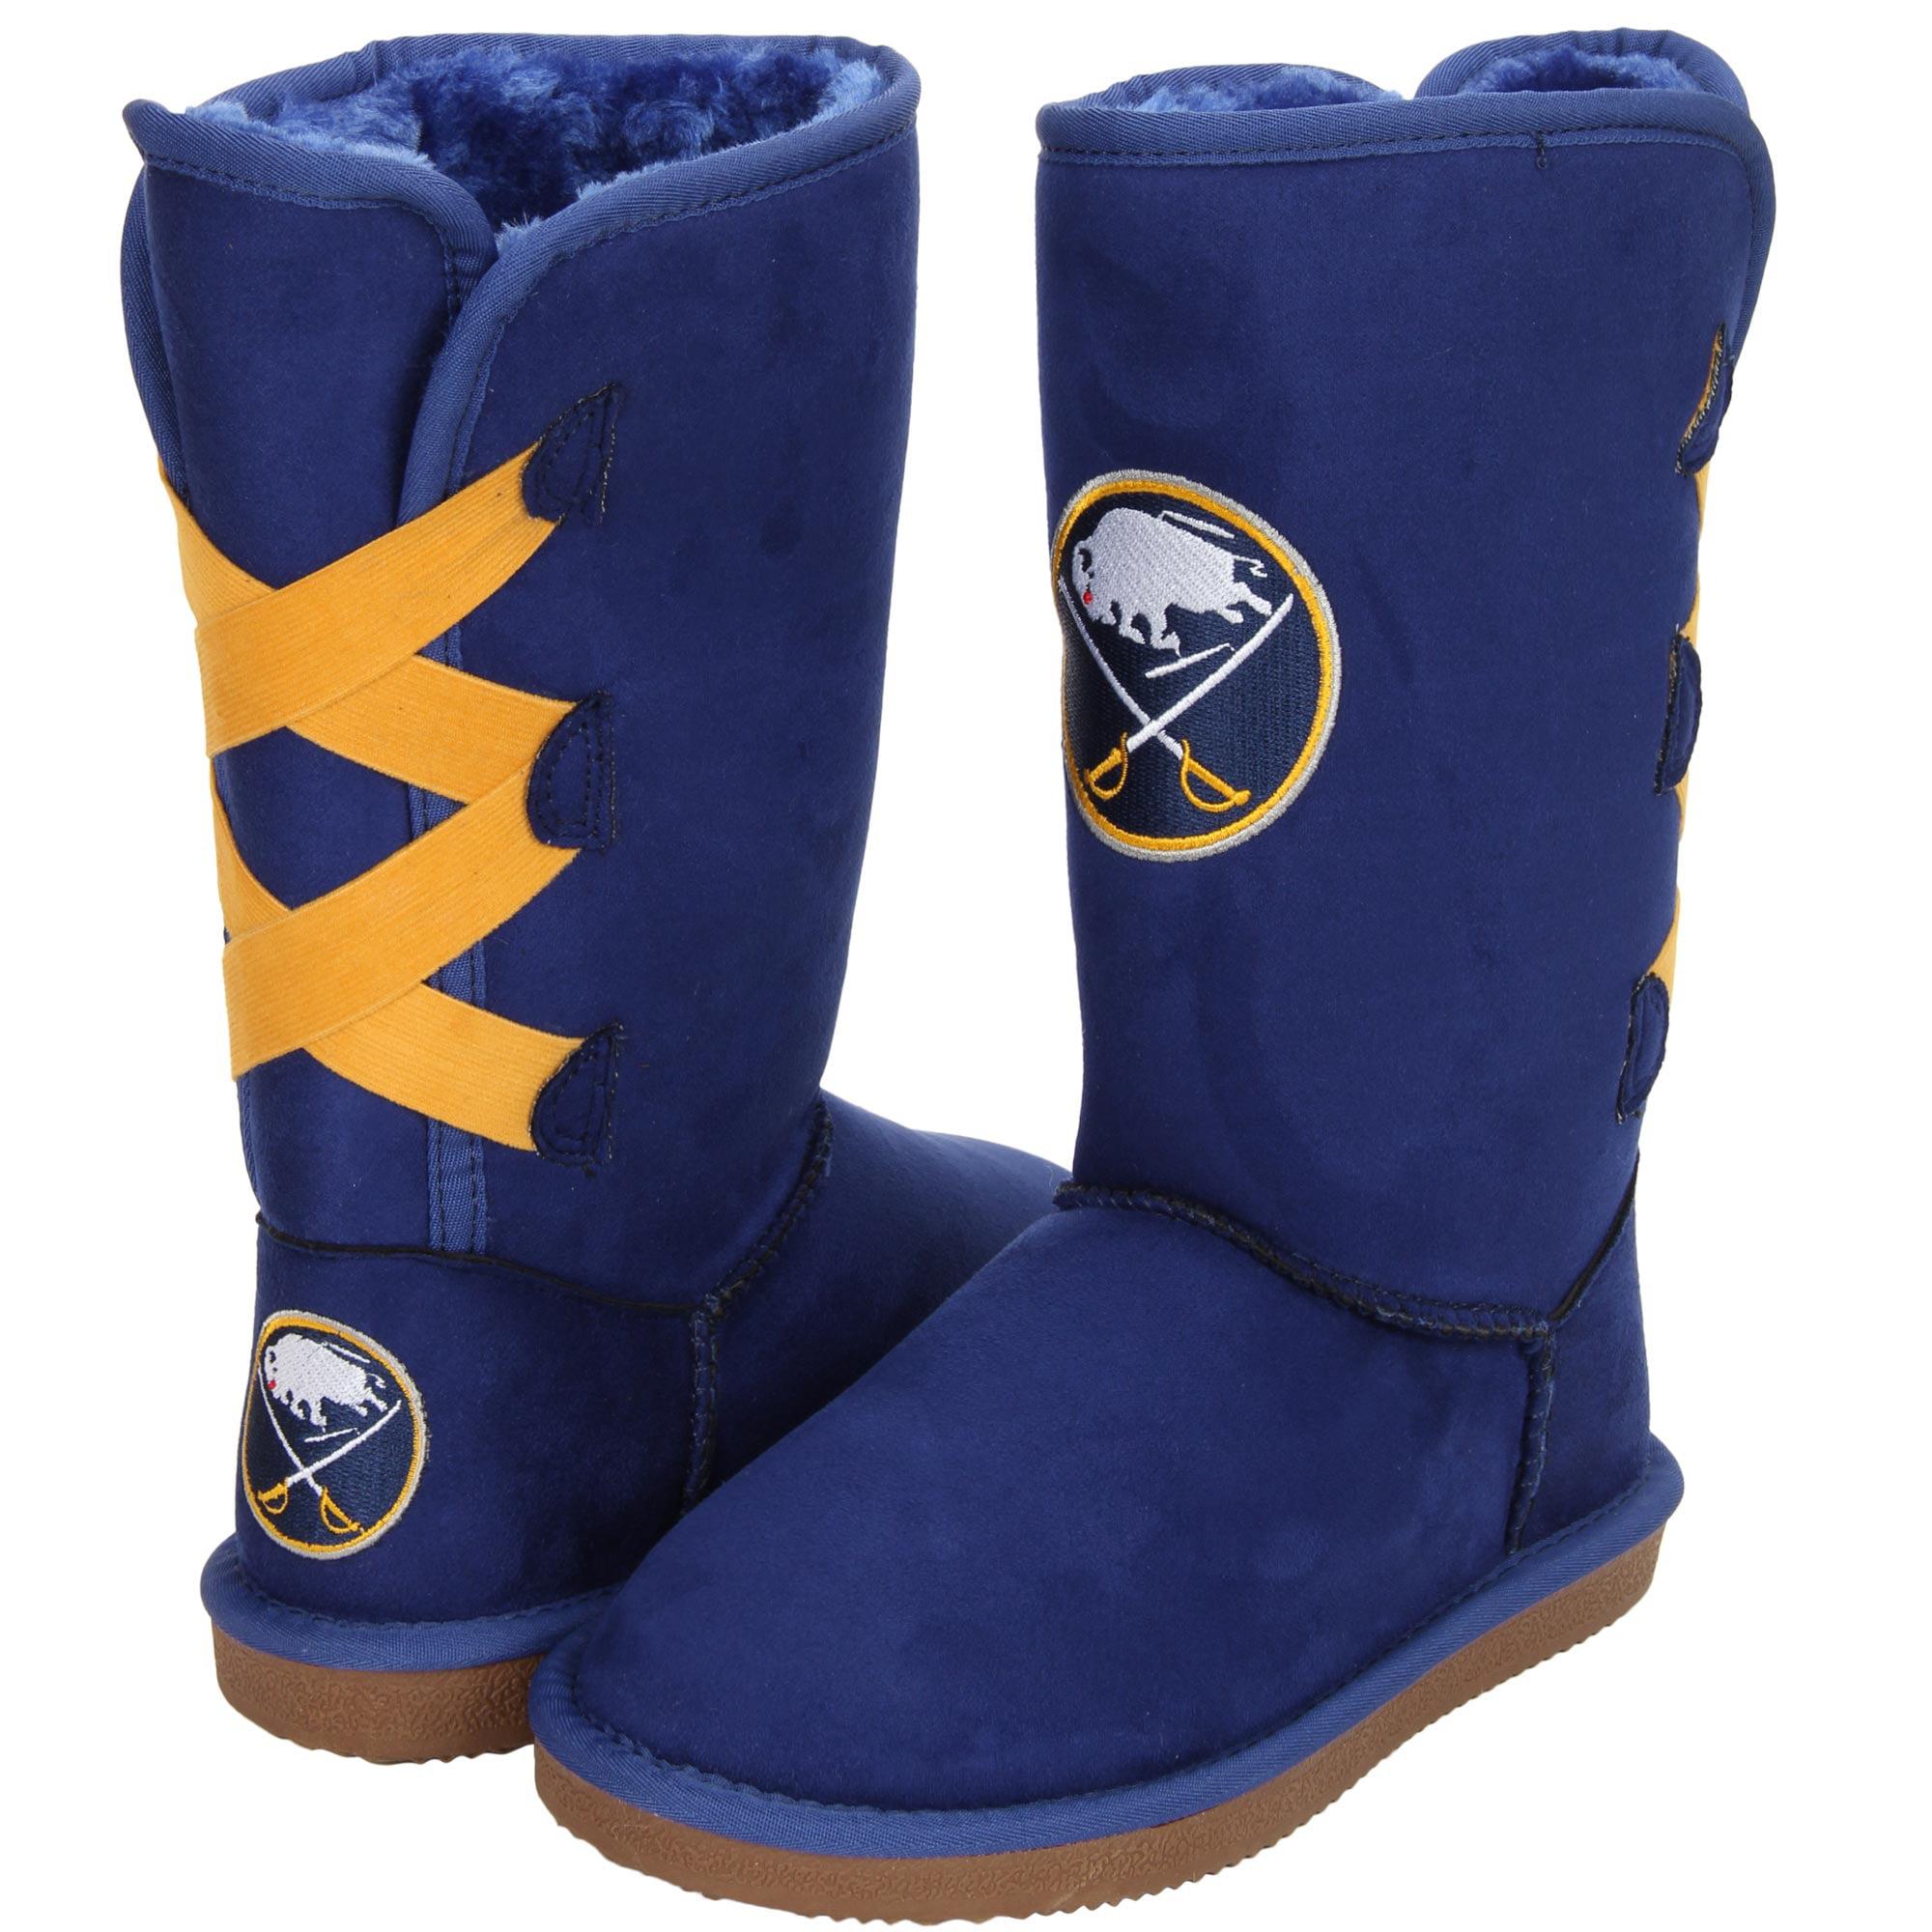 Women's Cuce Buffalo Sabres Conqueror Boots by Cuce Shoes